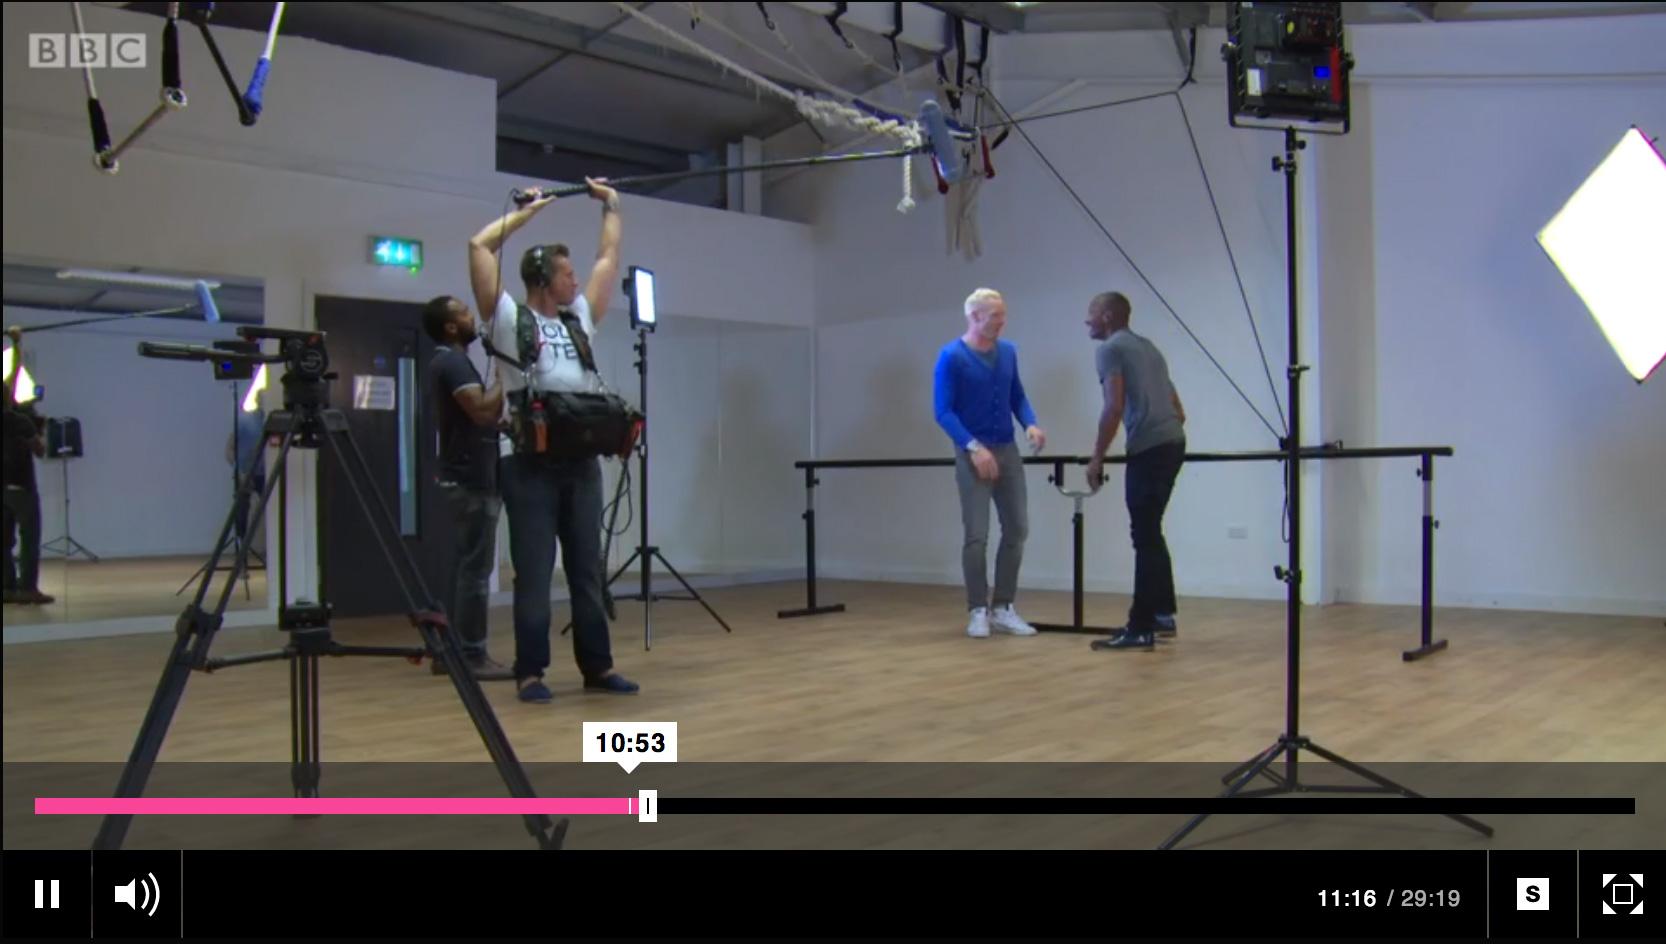 Eric-Underwood-BBC-one-show-Oct-2015-2